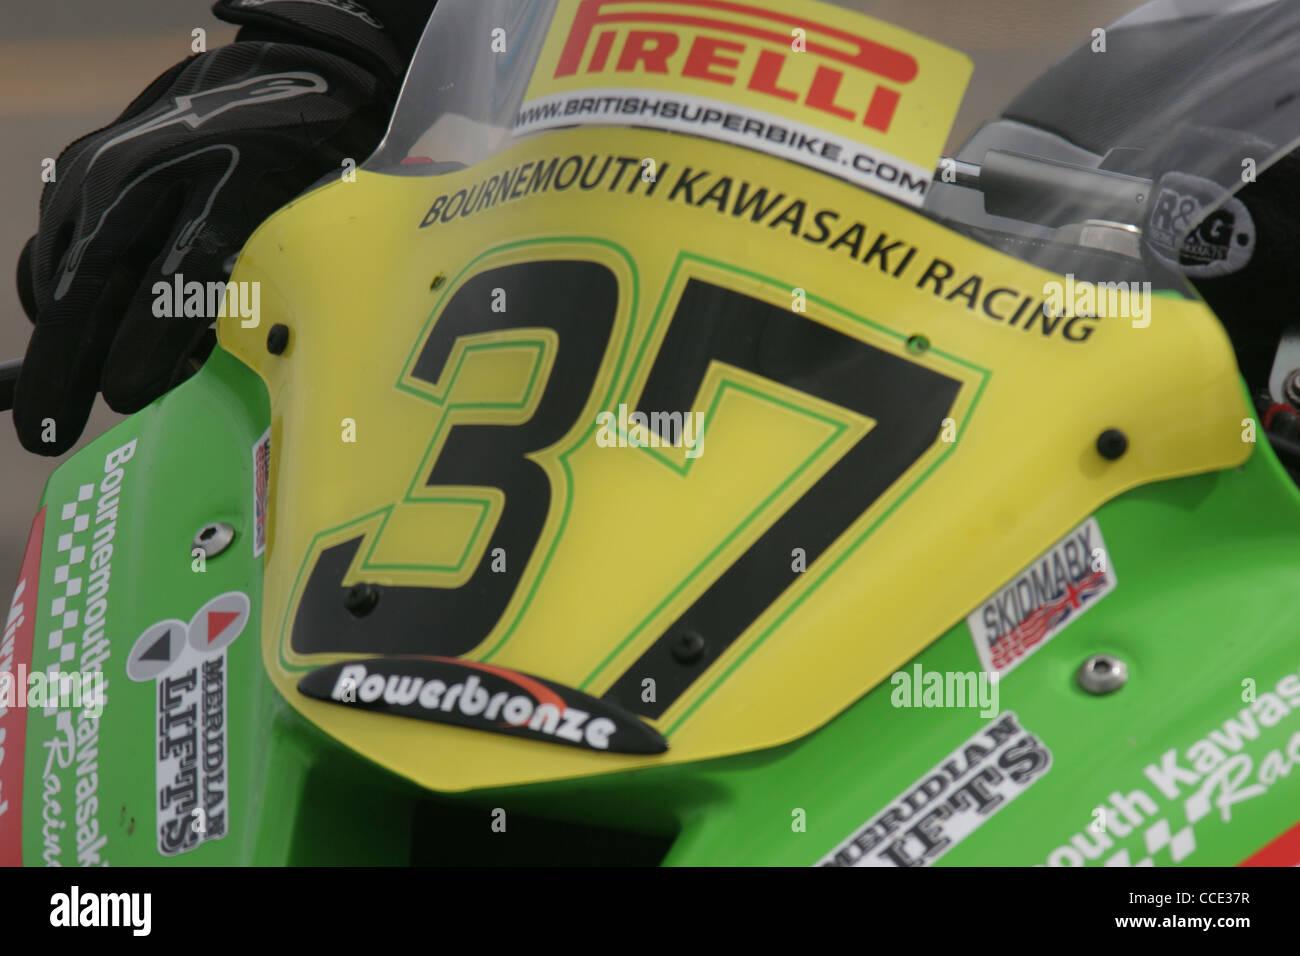 British Superbikes at Croft Circuit - Stock Image